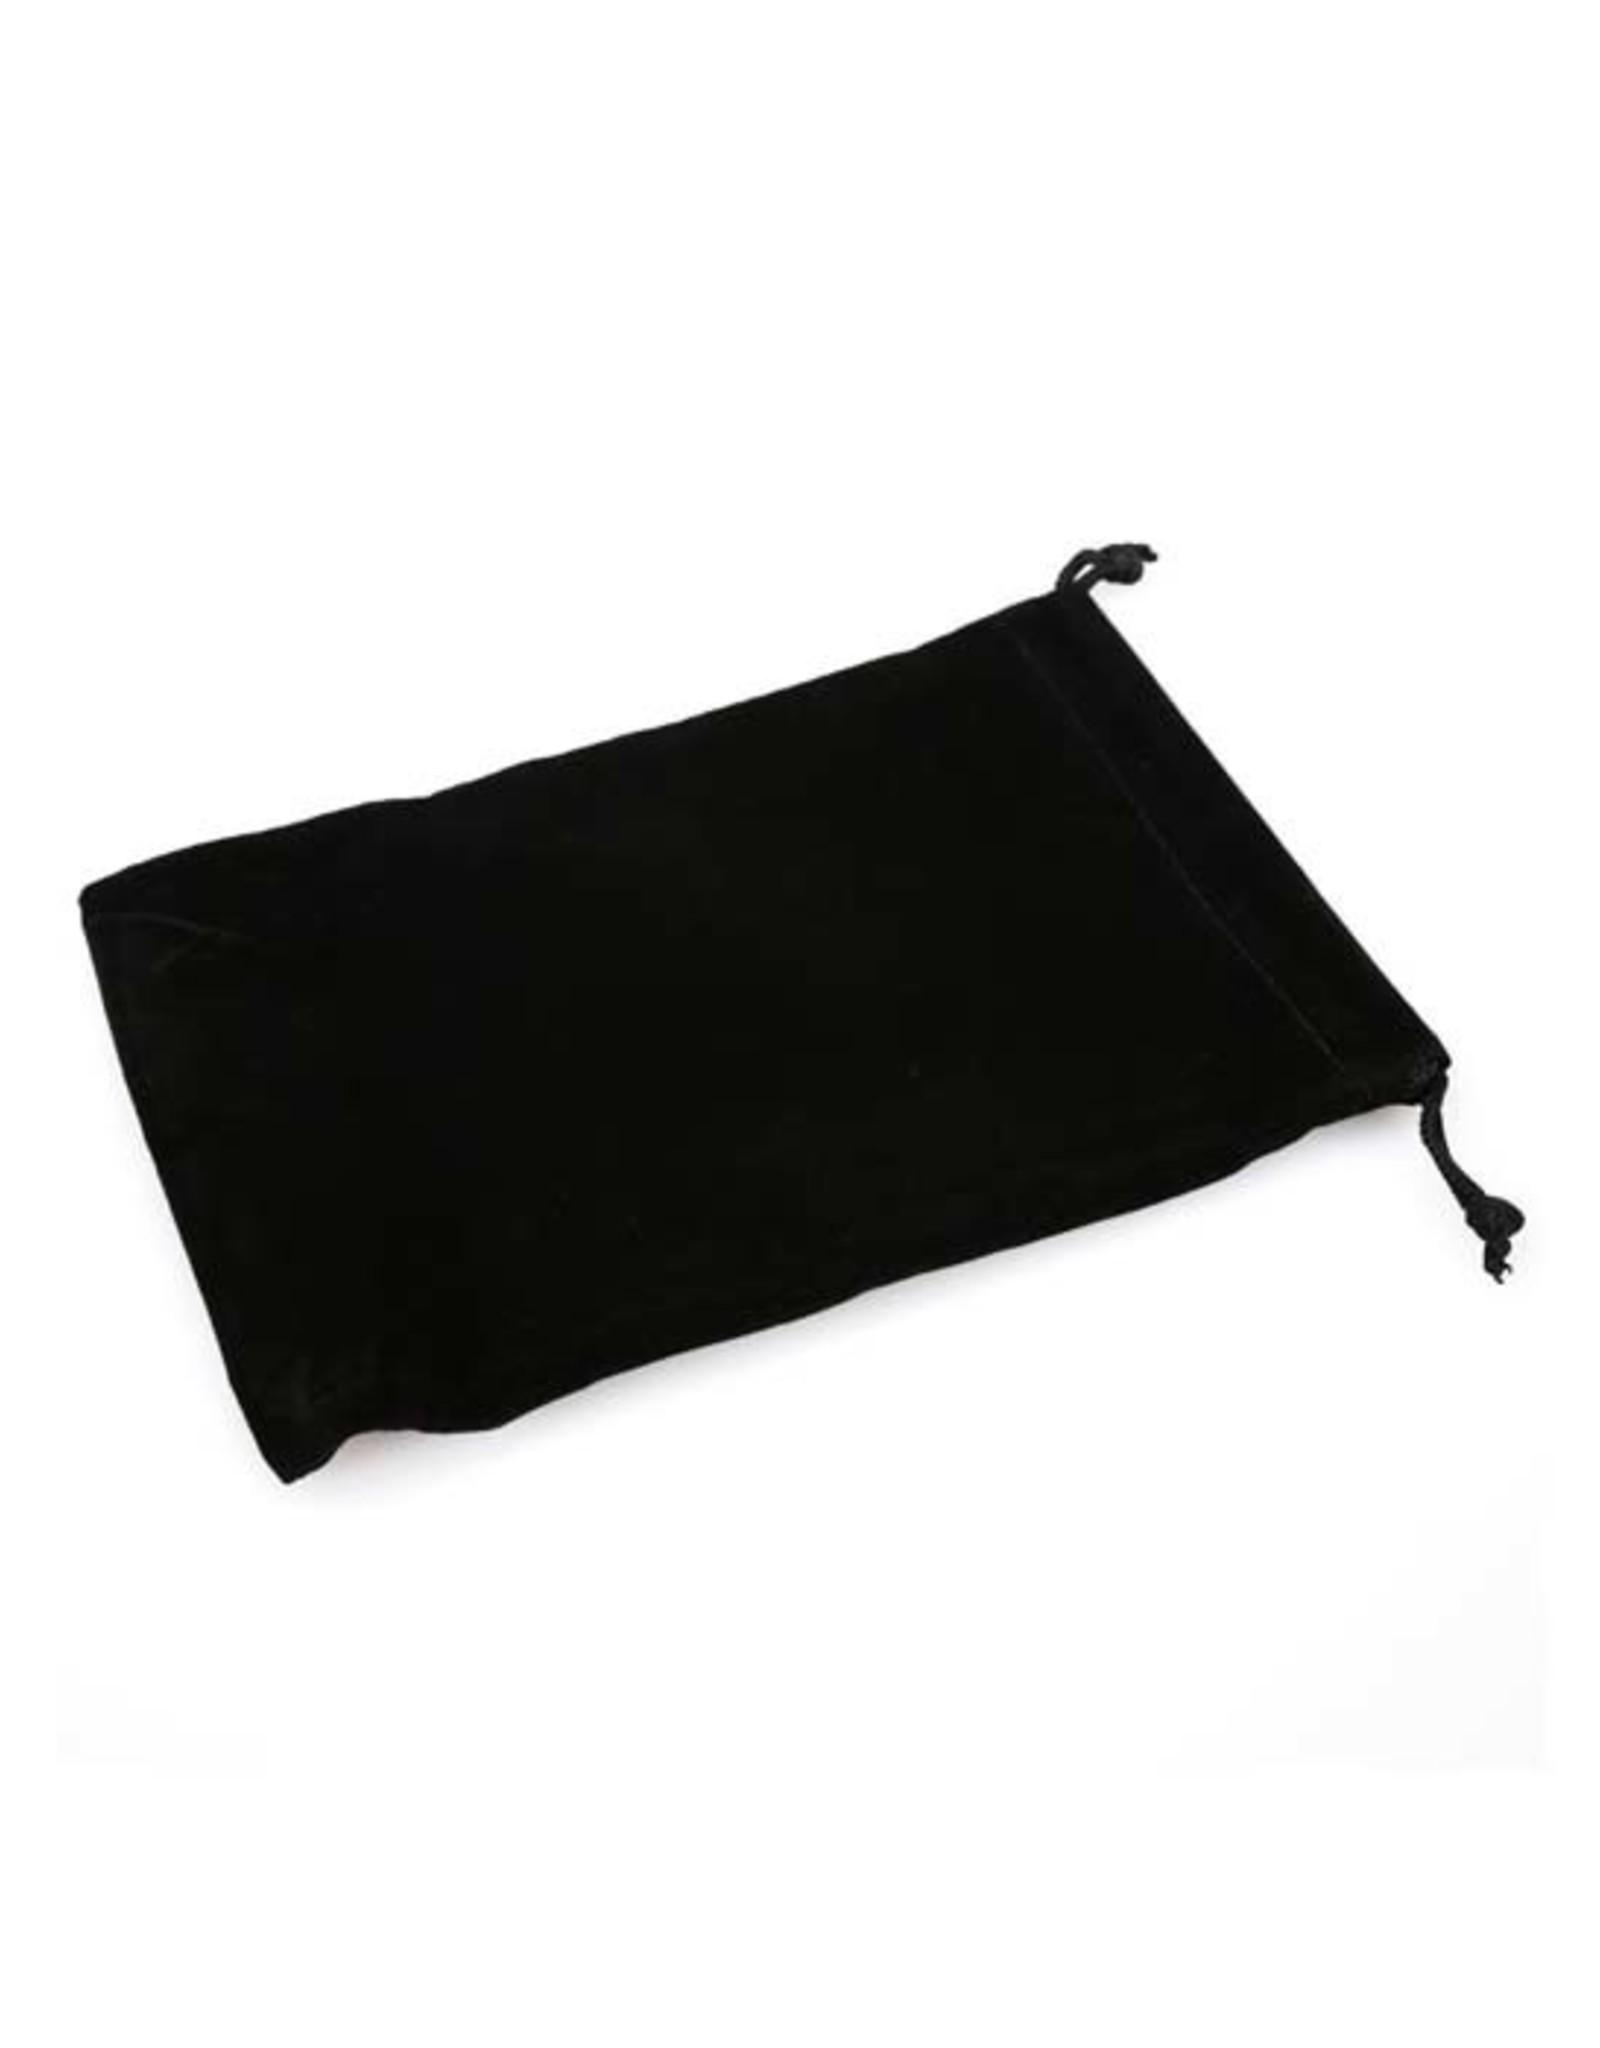 Chessex Chessex: Dice Bag - Large - Black